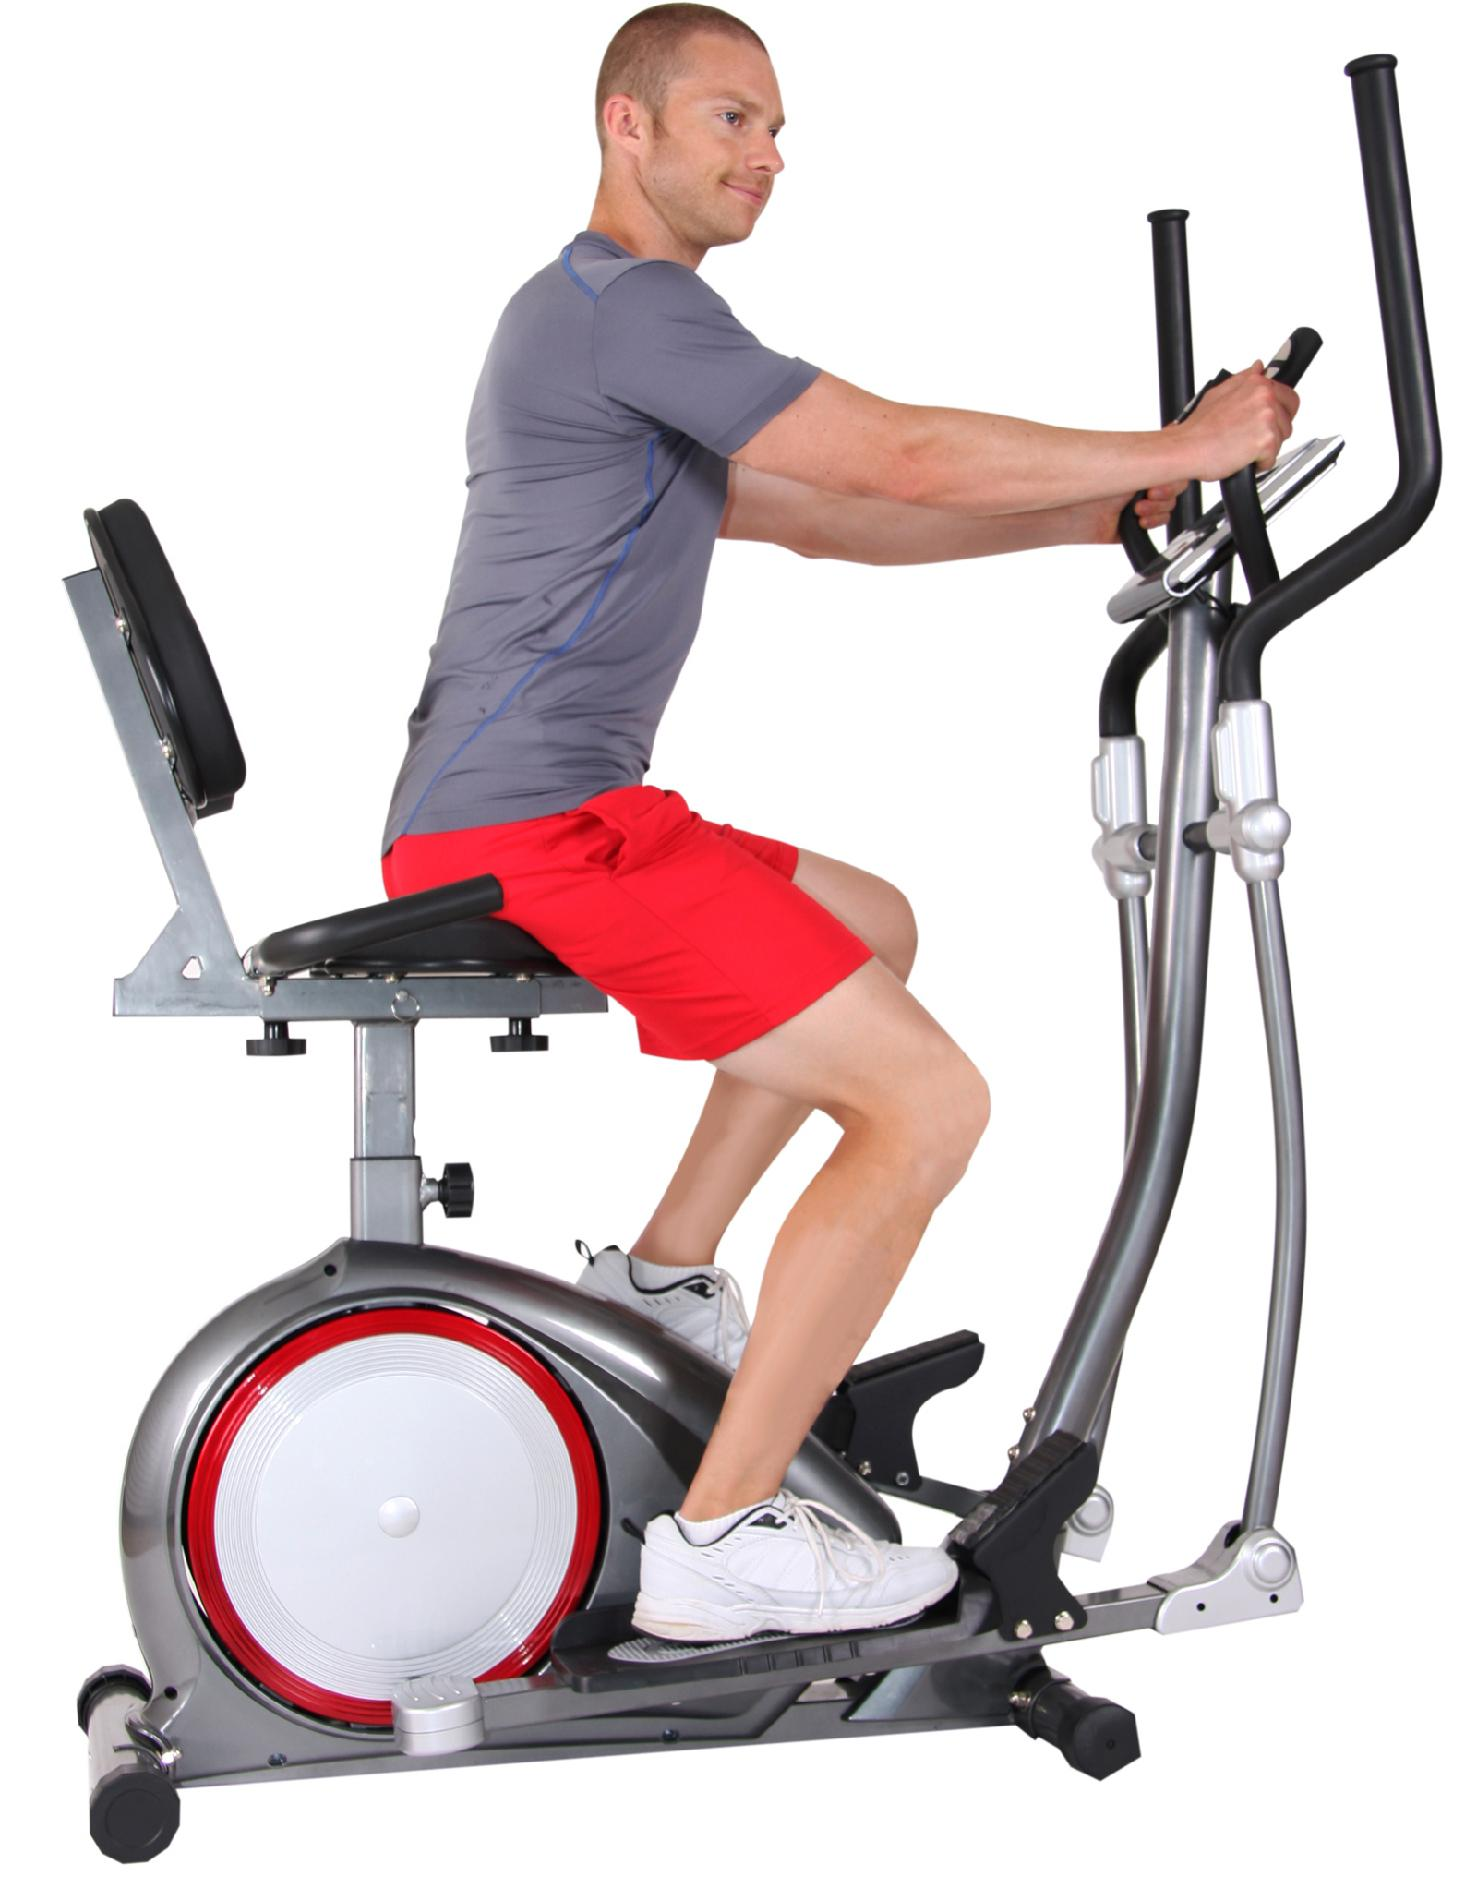 Body Flex Body Power 3-In-1 Trio Trainer